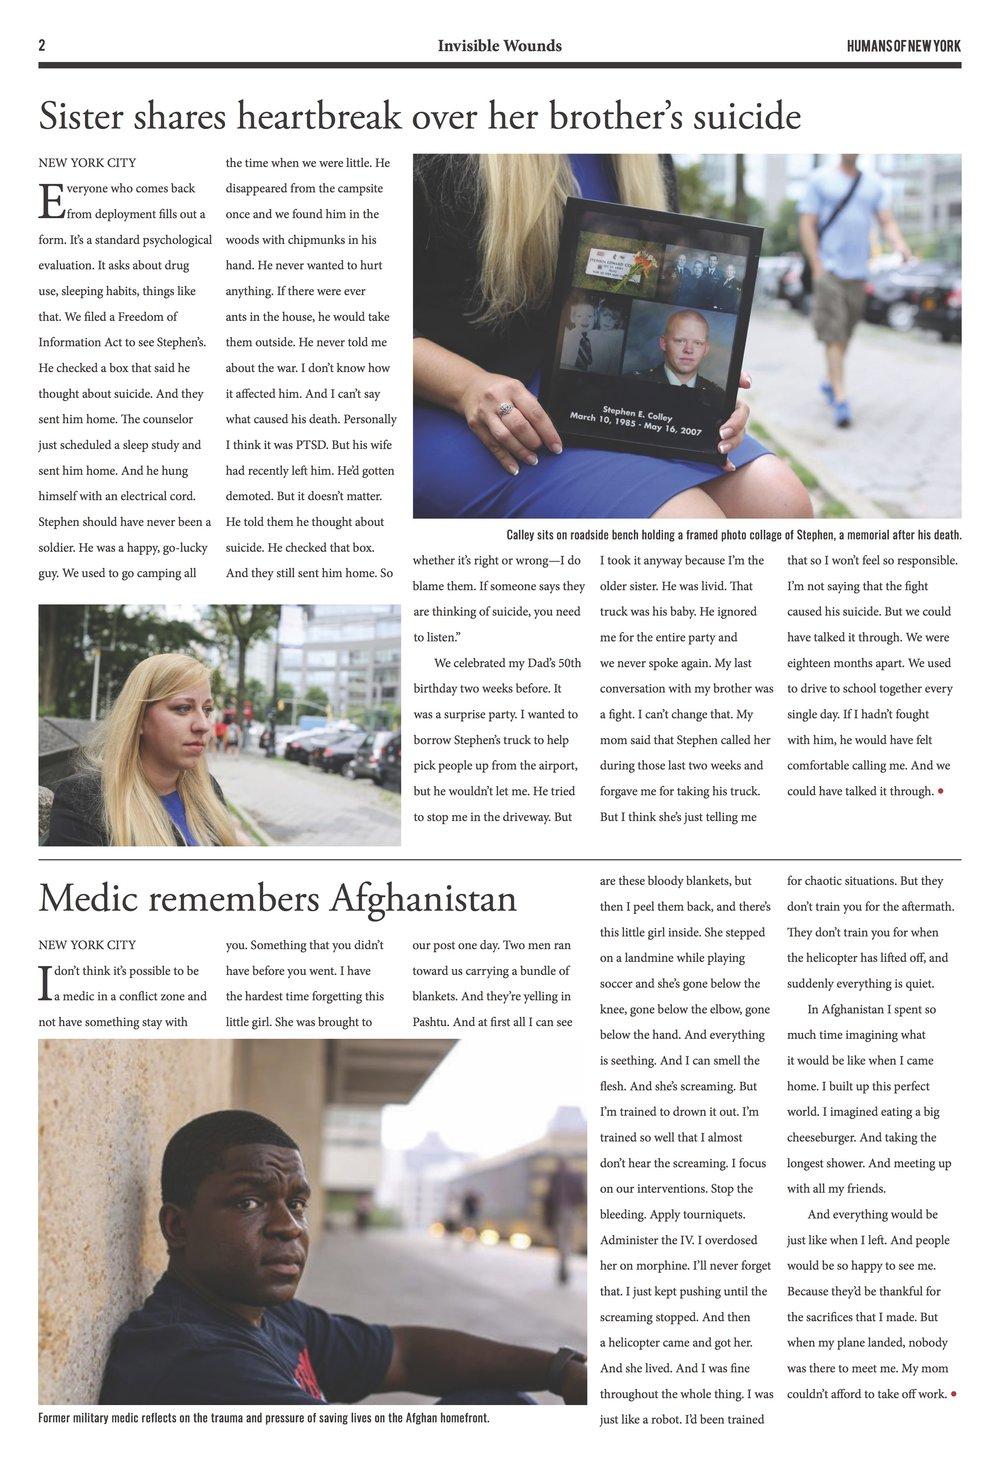 482Bulkeley_HONYNewspaper6spreads.jpg